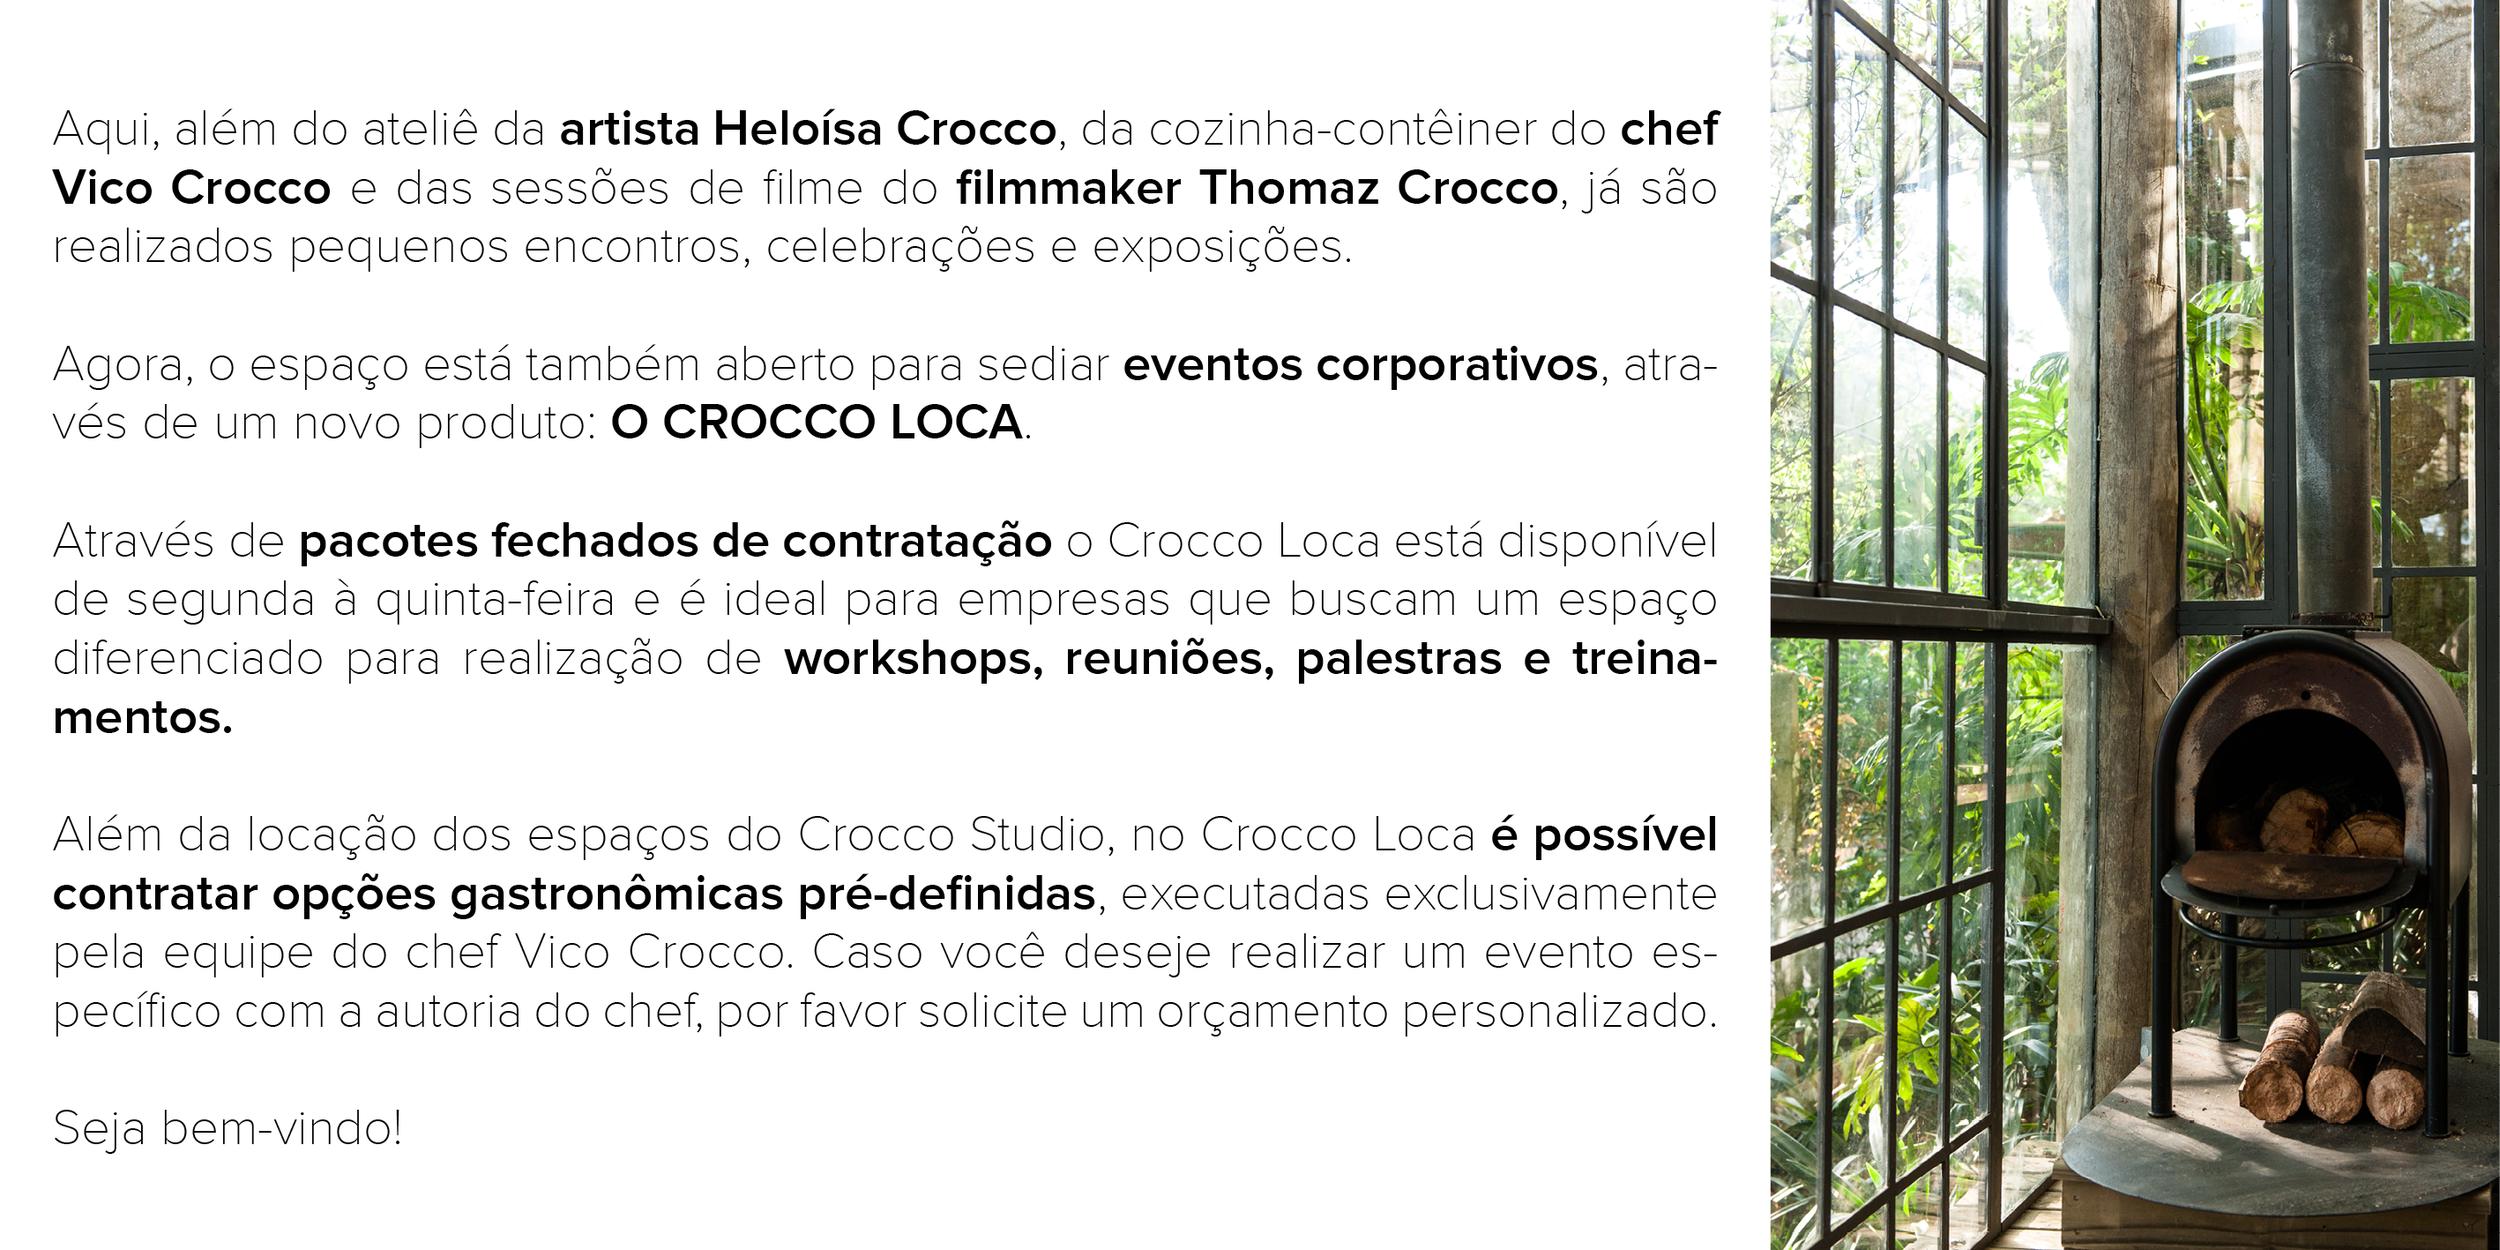 Crocco Loca 2.png